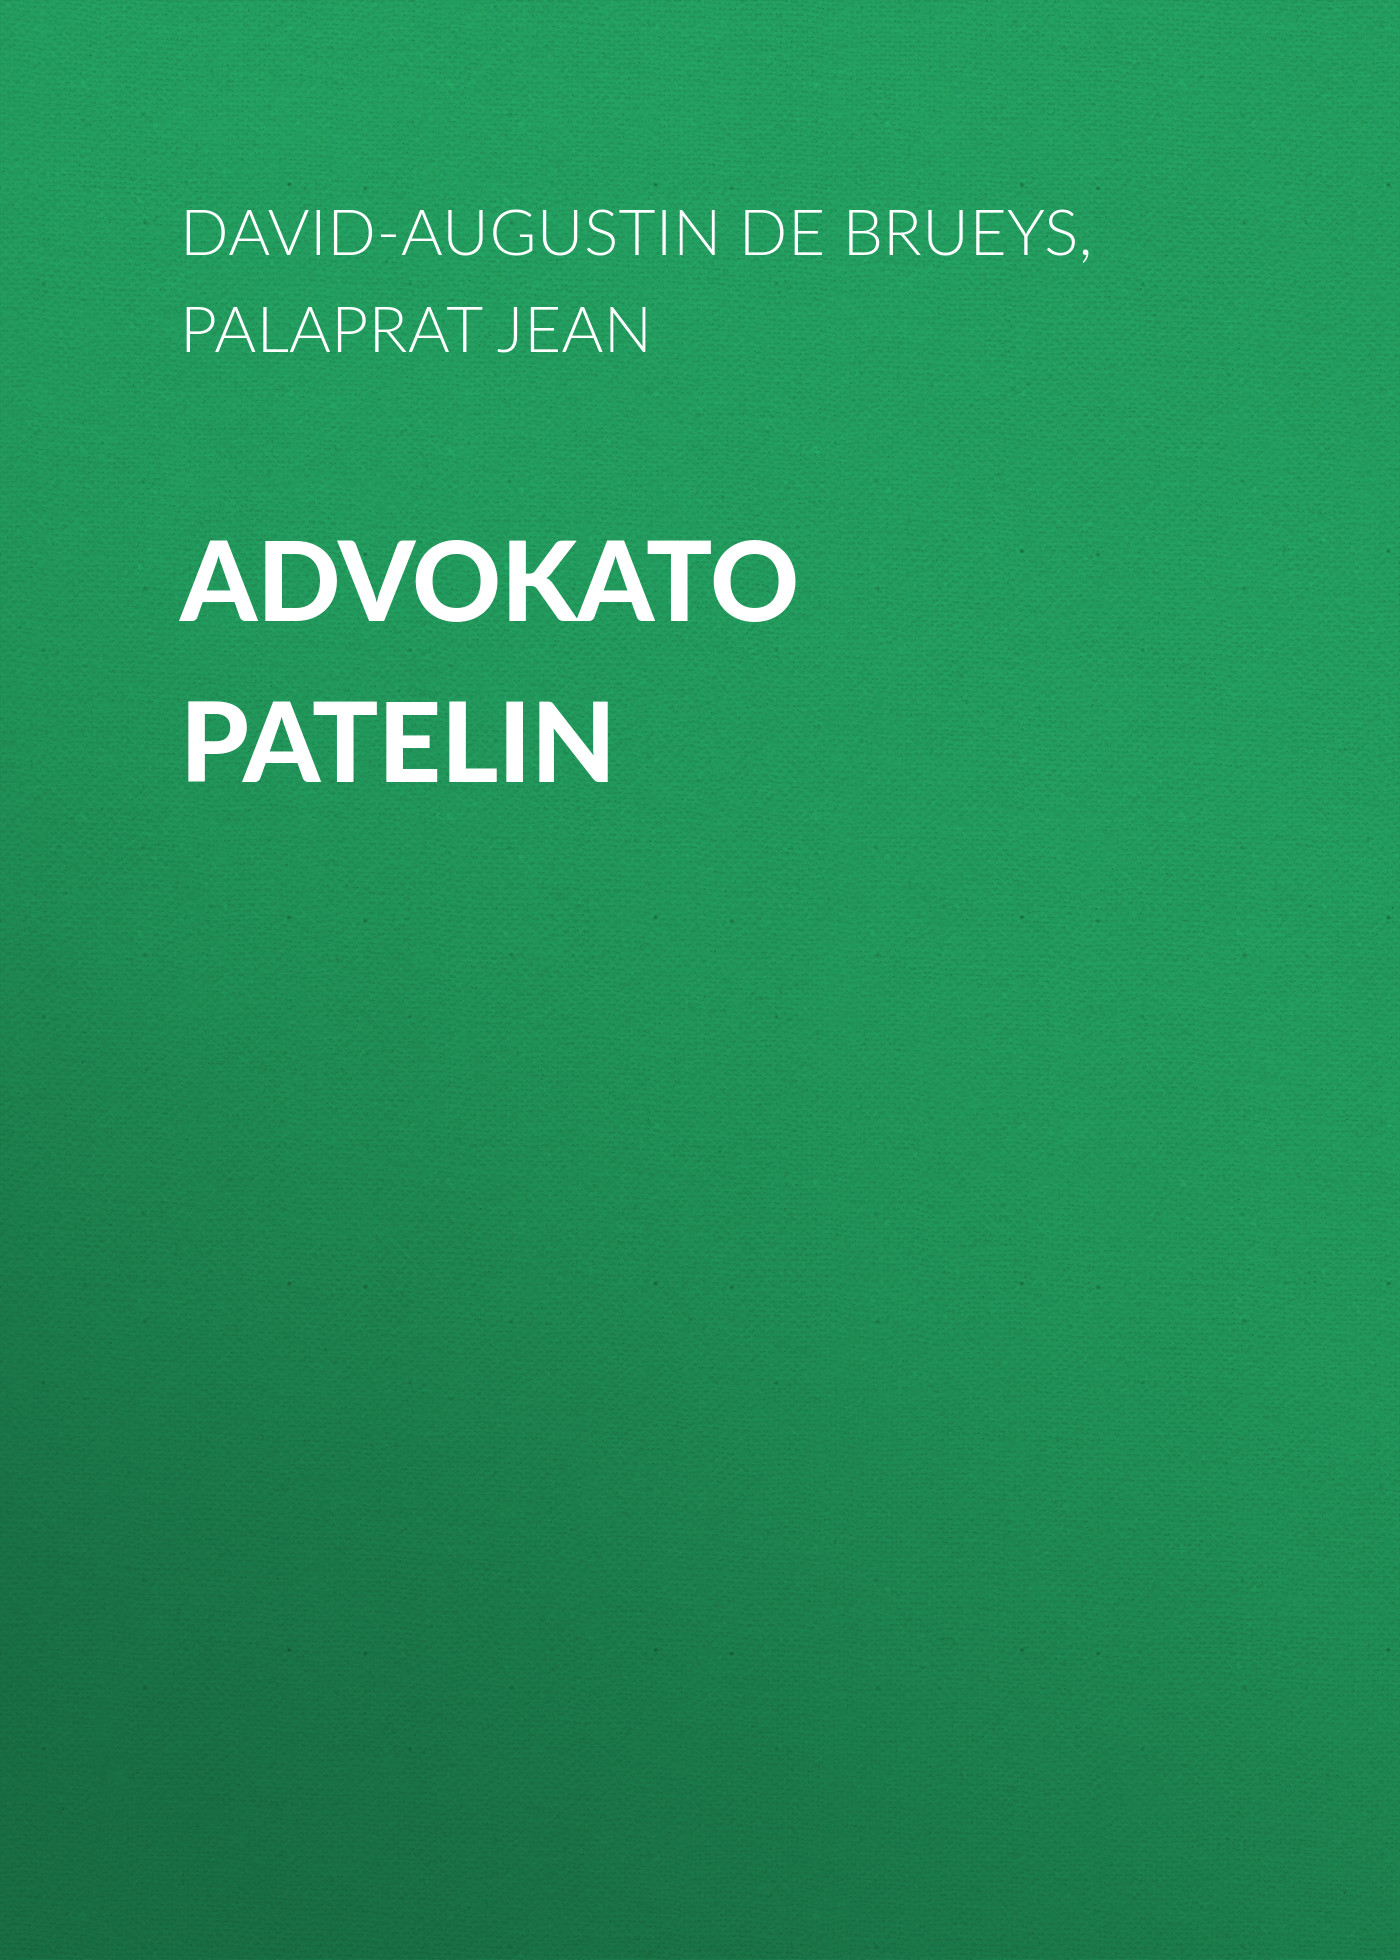 цена David-Augustin de Brueys Advokato Patelin в интернет-магазинах